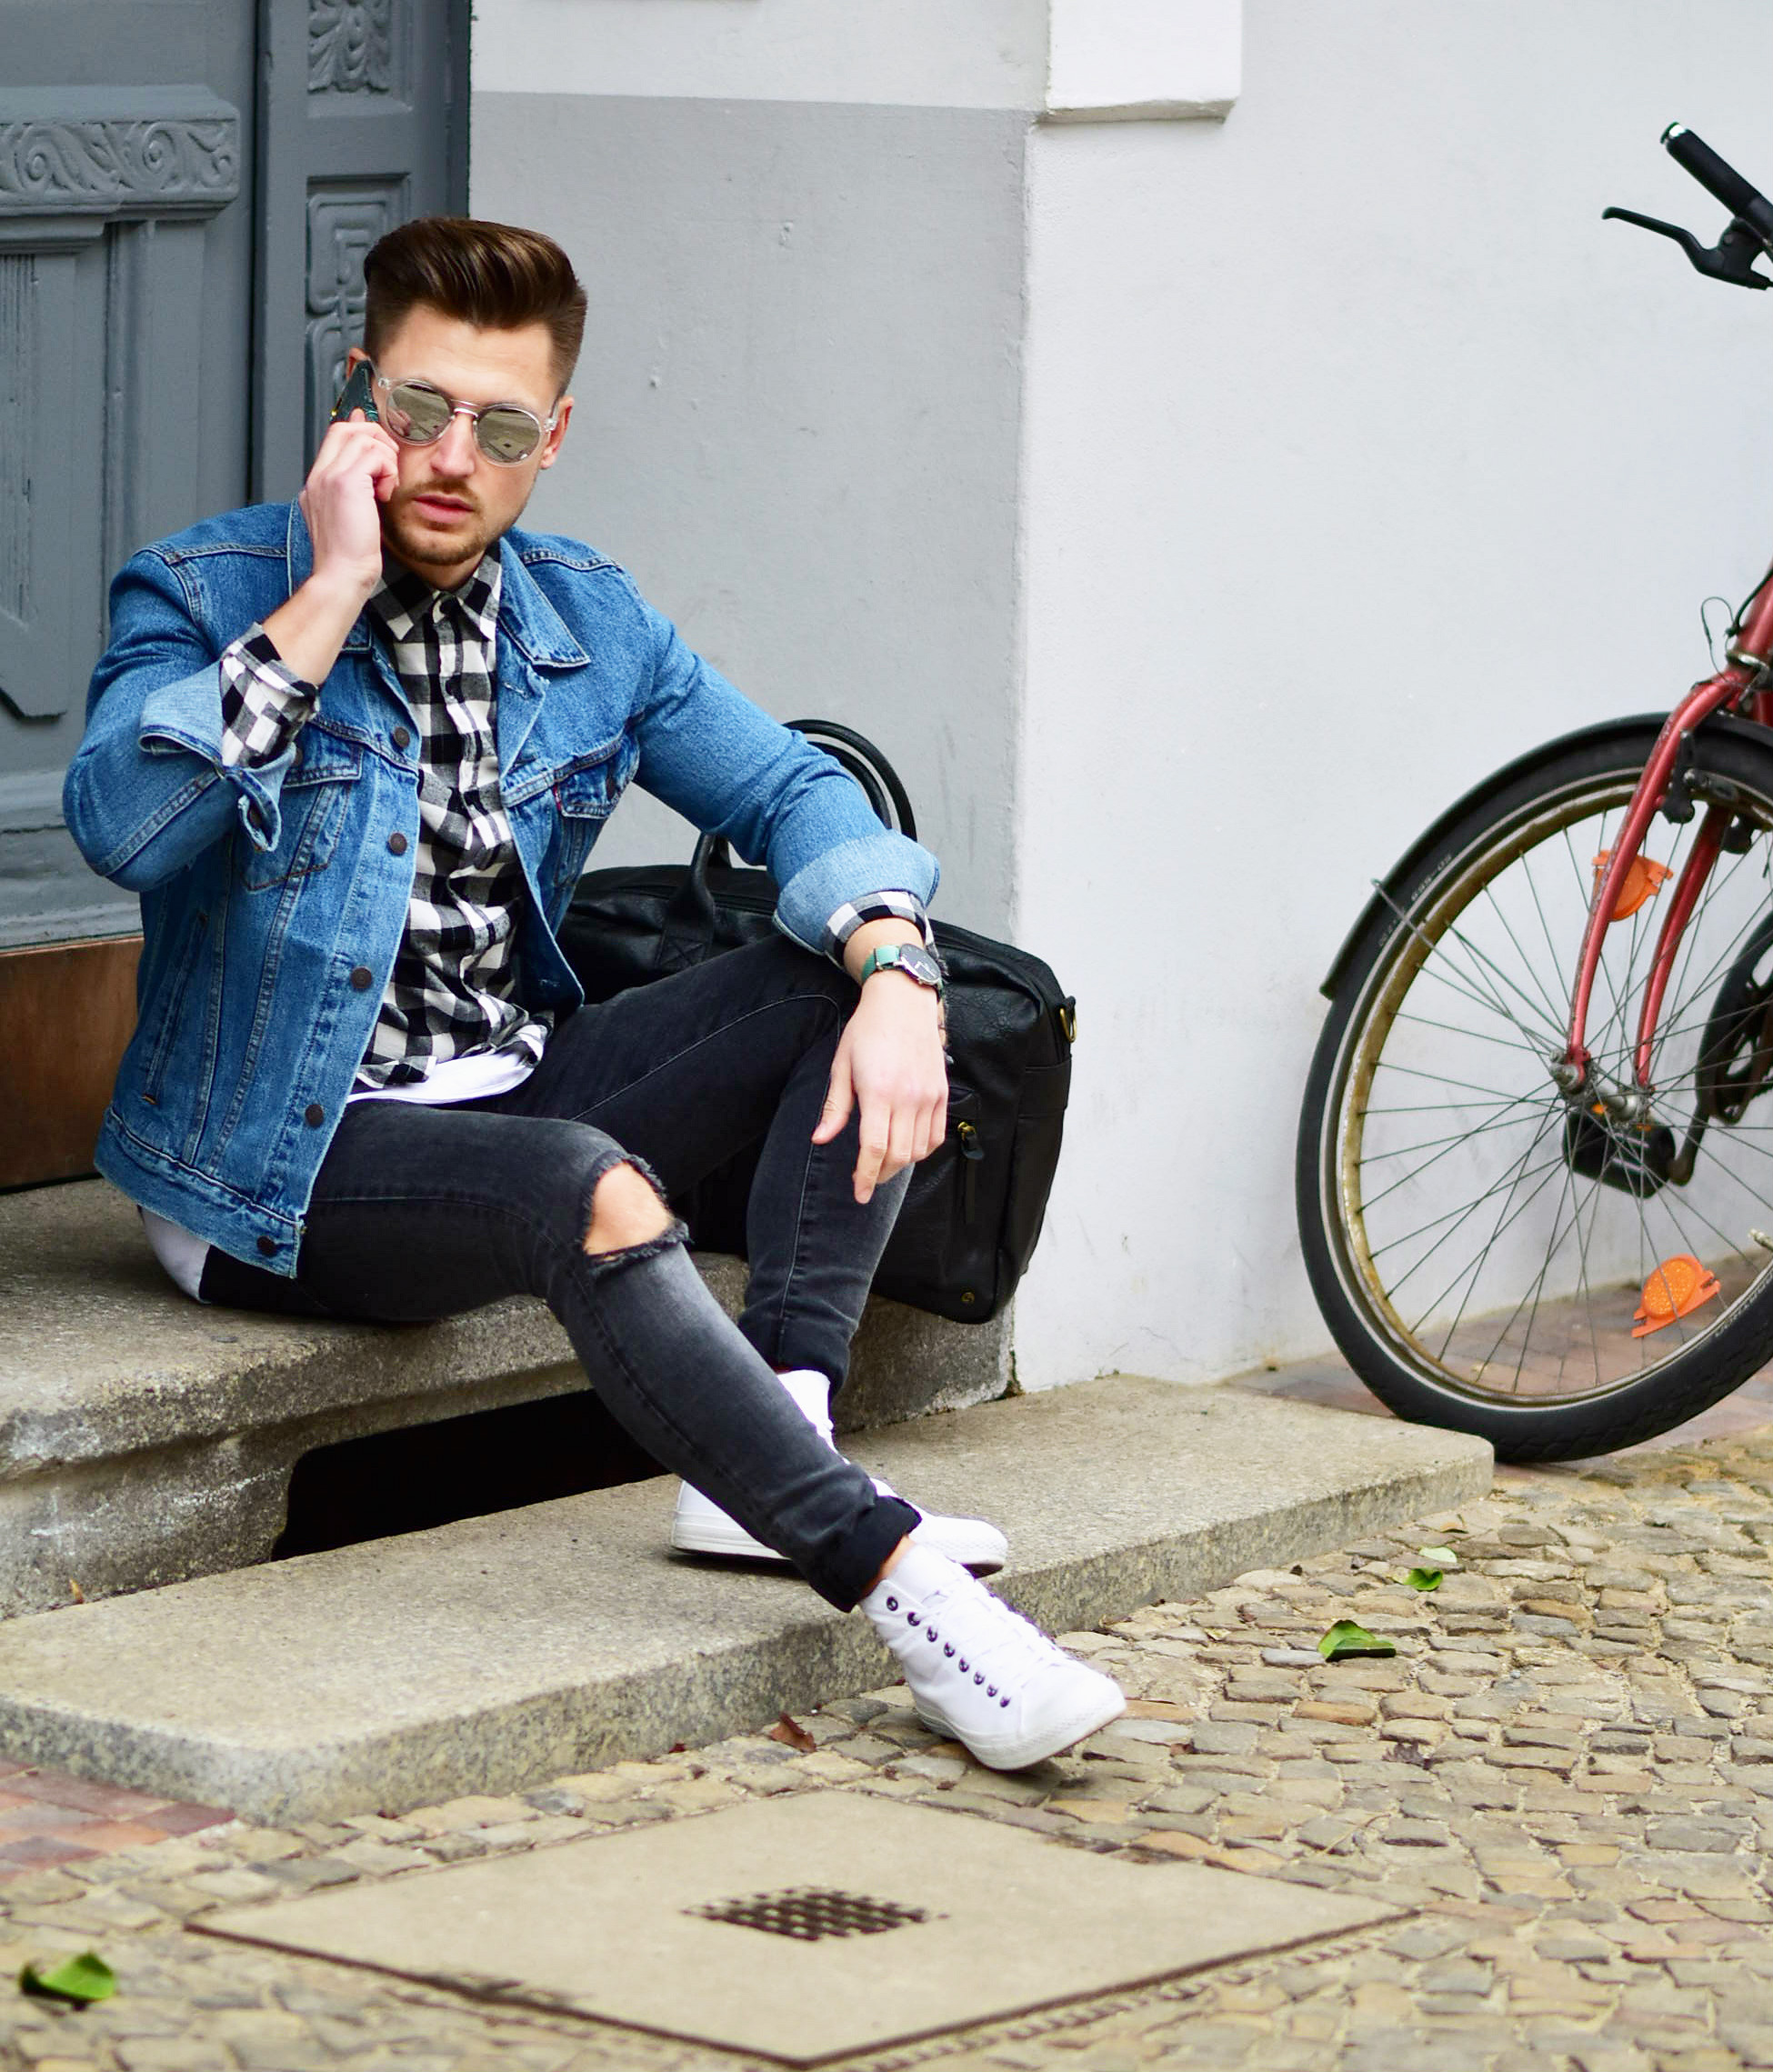 Tommeezjerry-Styleblog-Männerblog-Modeblog-Berlin-Outfit-Jeanslook-Ripped-Jeans-Jeansjacke-Levis-Converse-Chucks-Travelbag